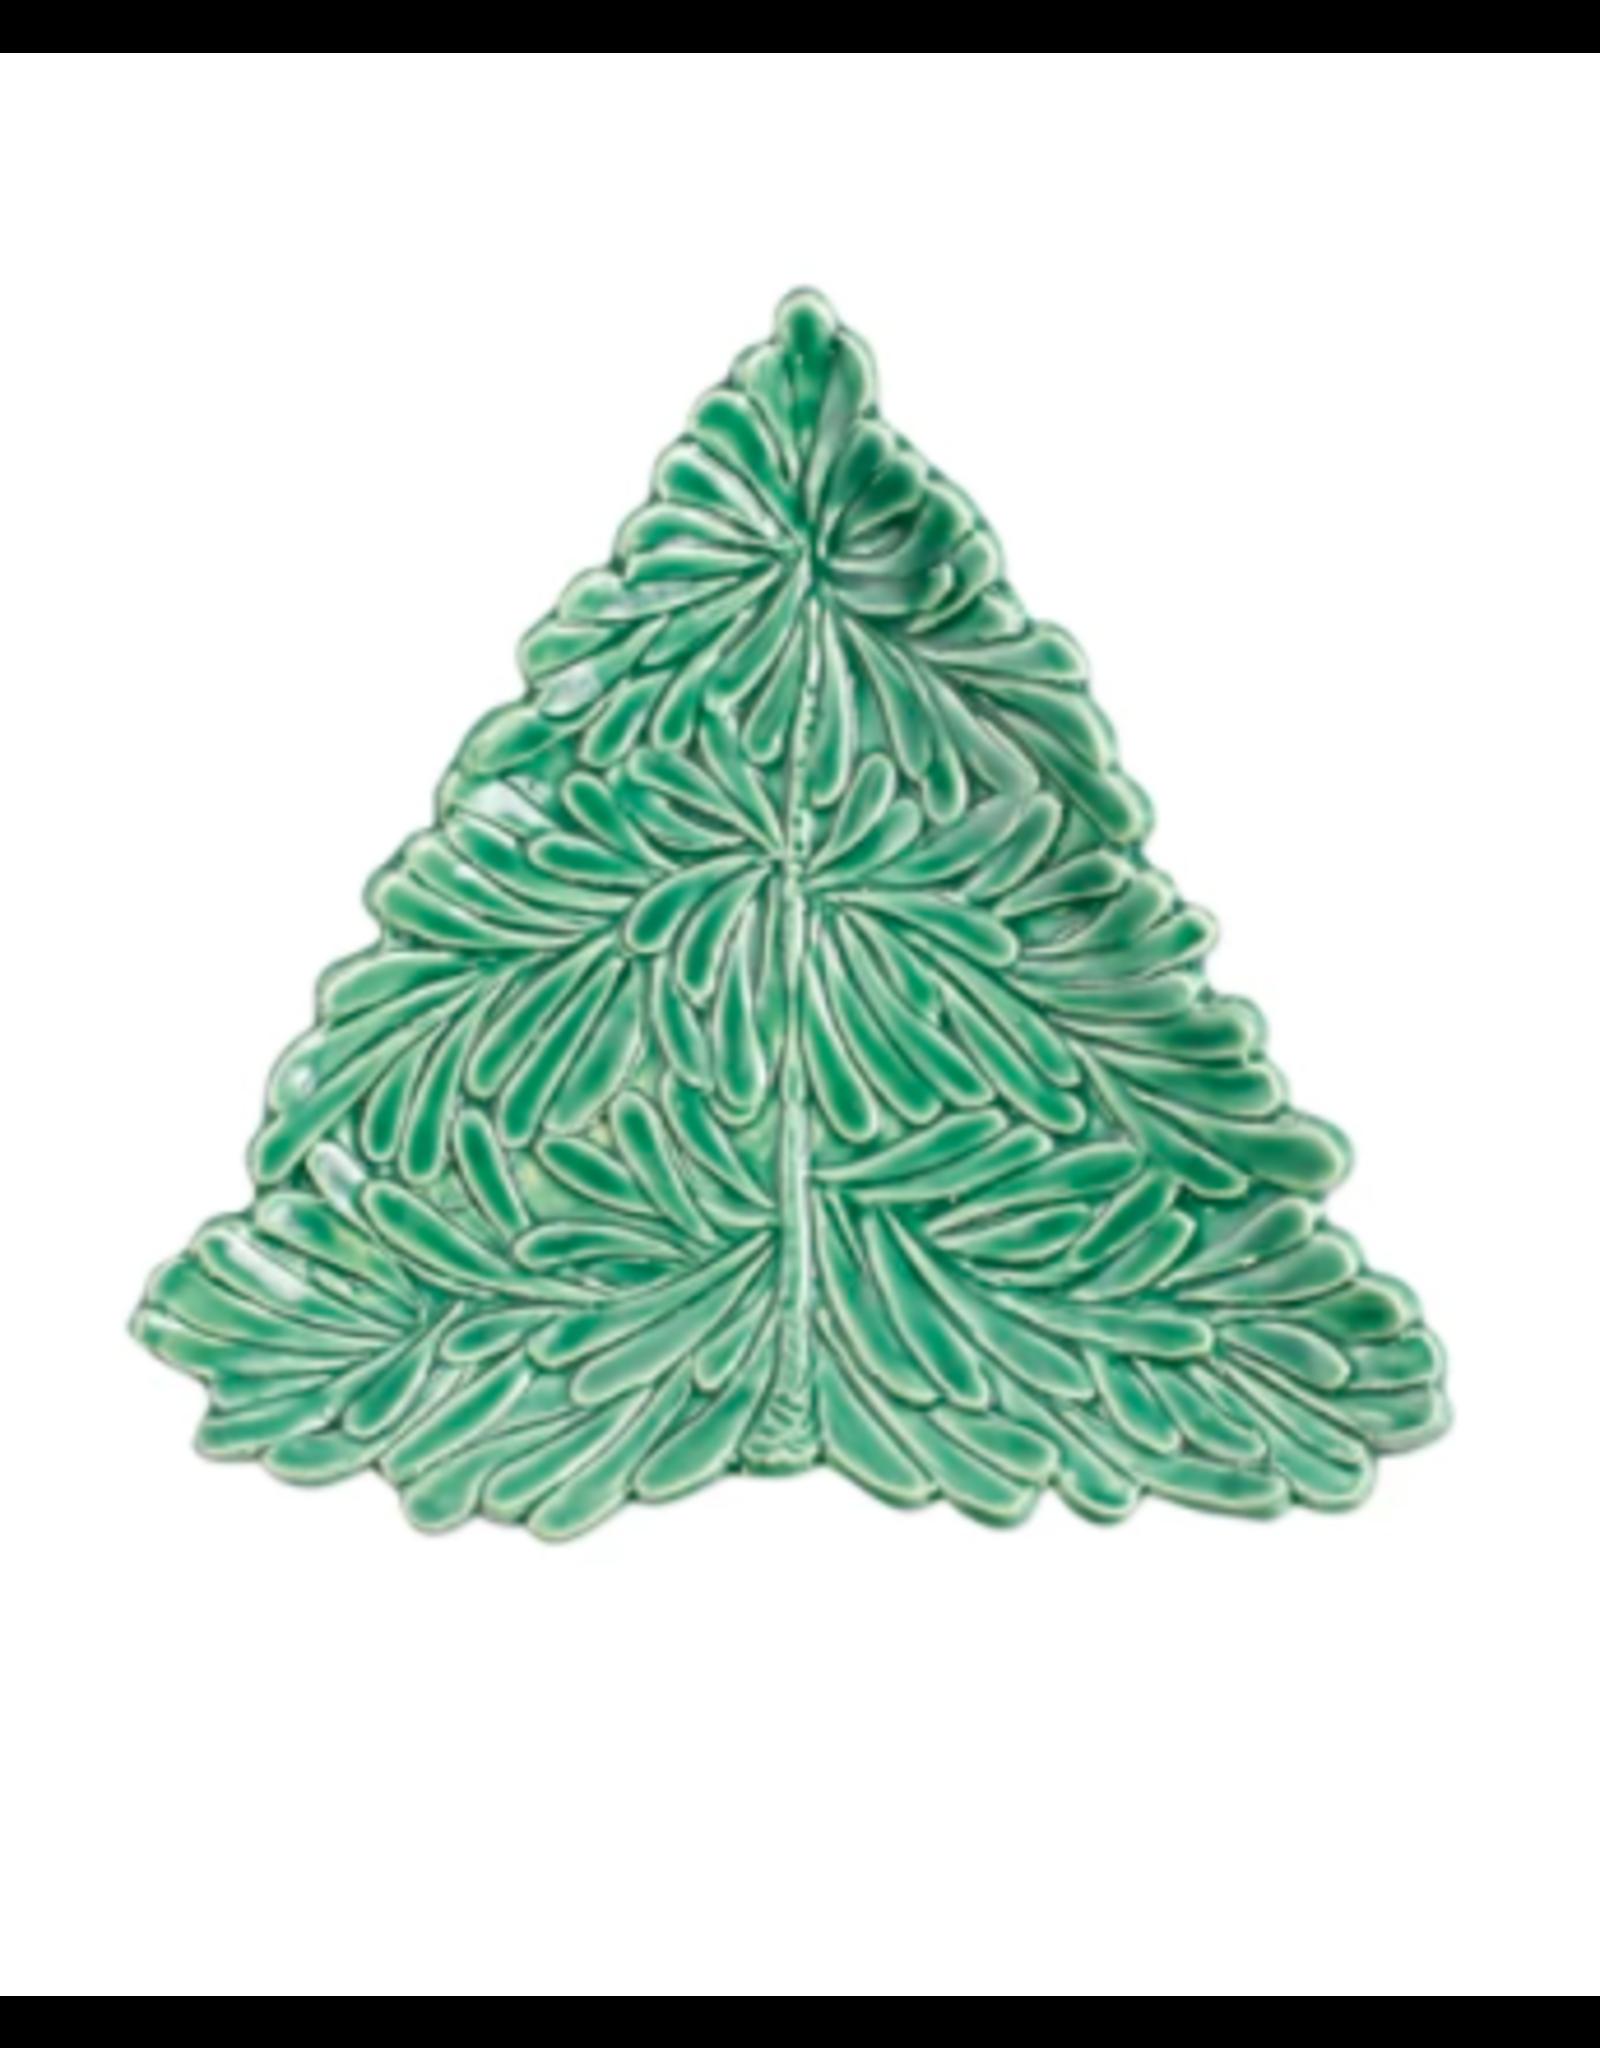 Vietri Lastra Holiday Tree Small Plate